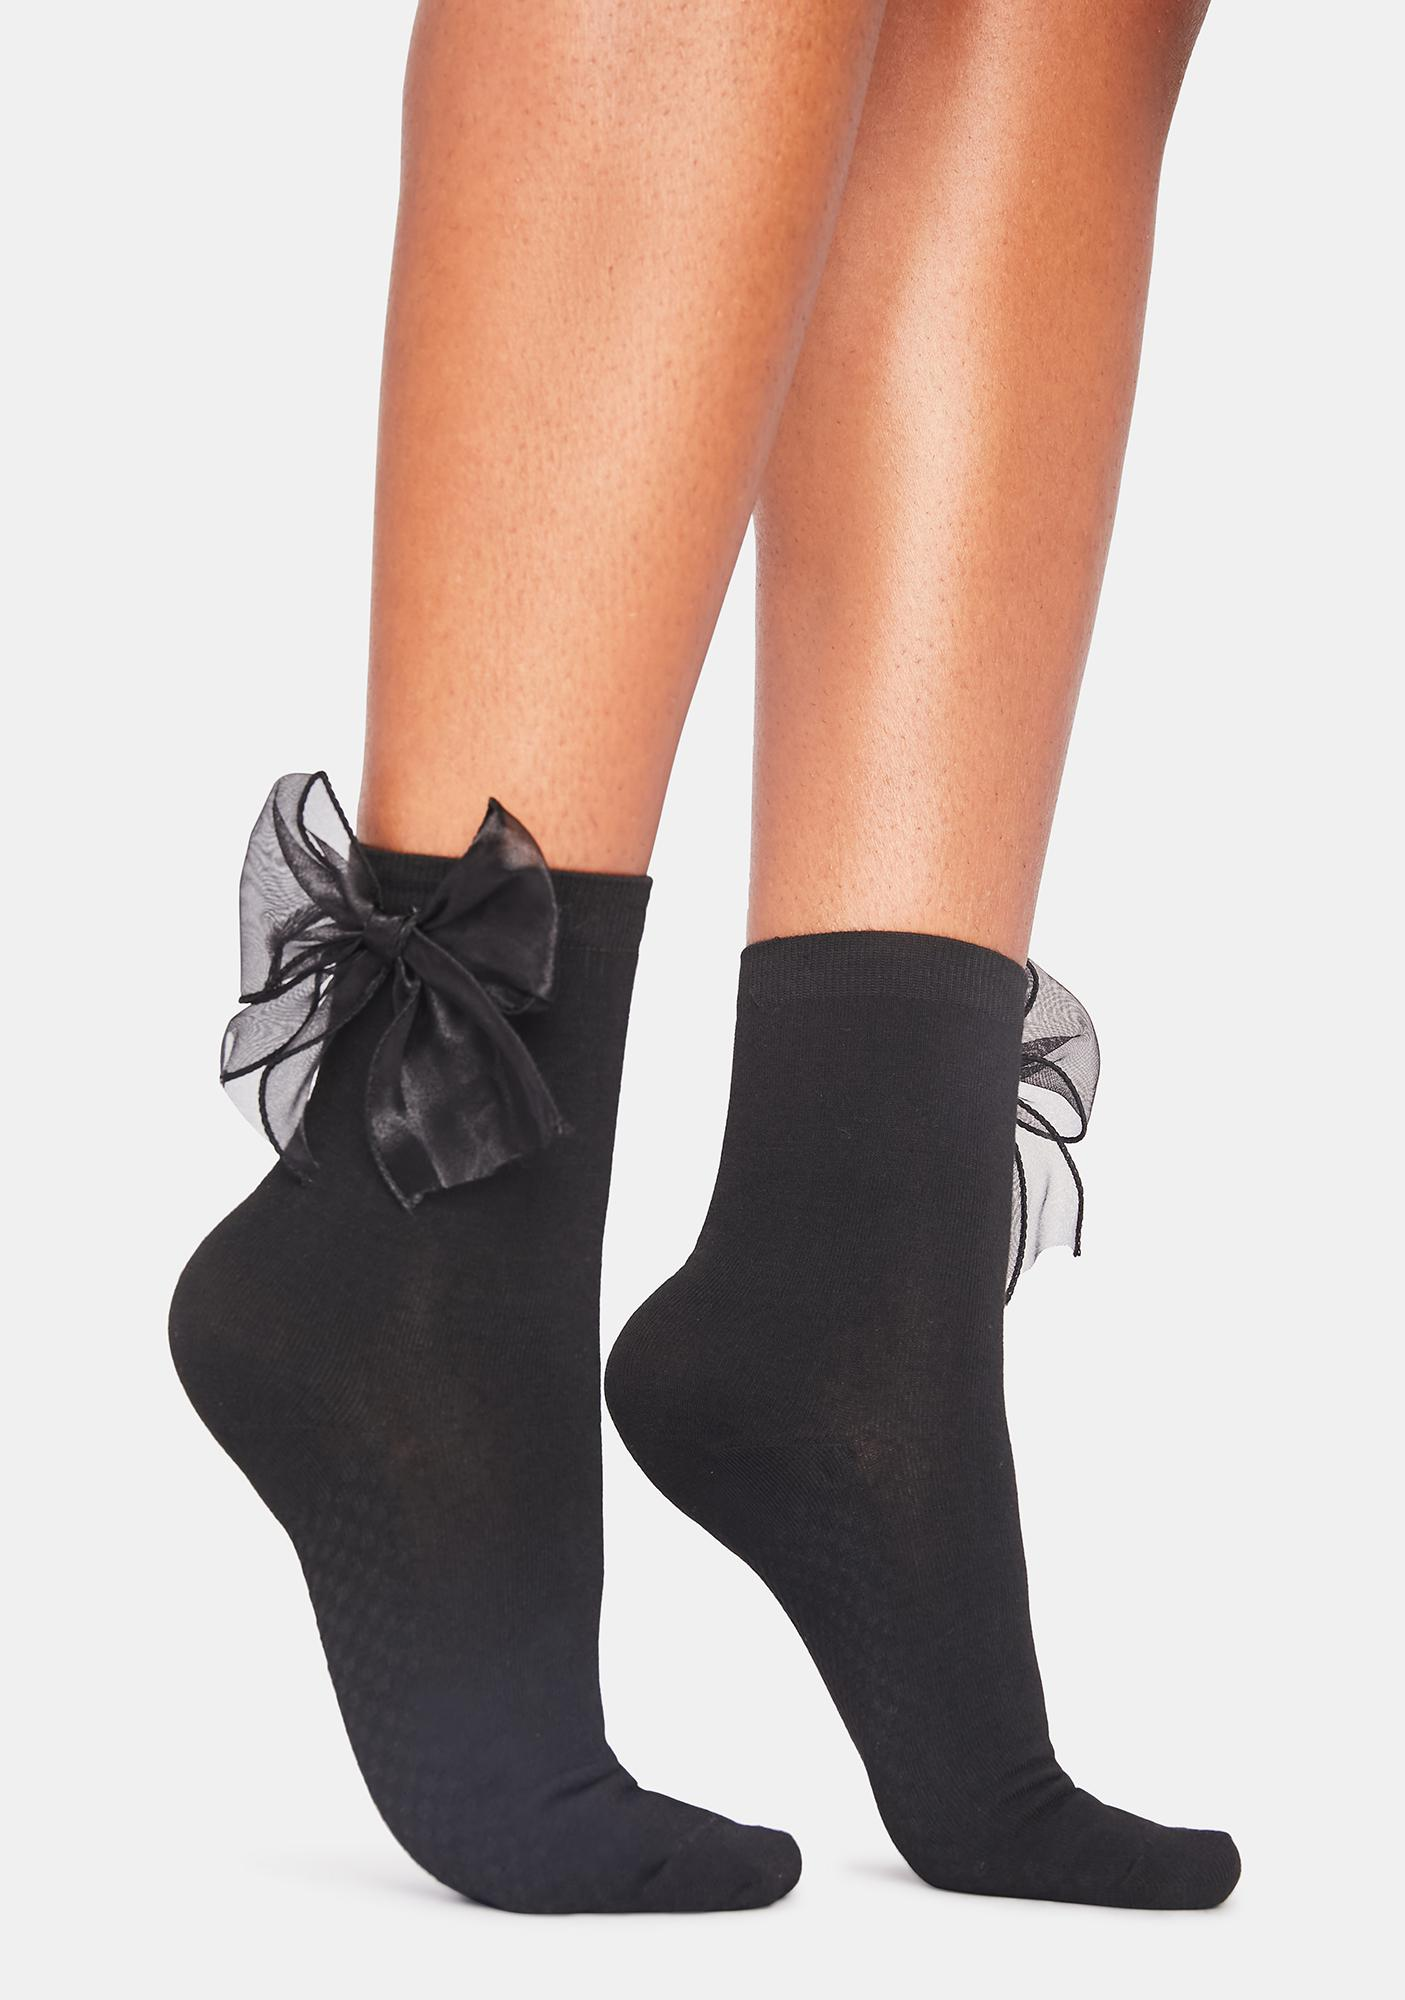 Take Some Time Bow Socks